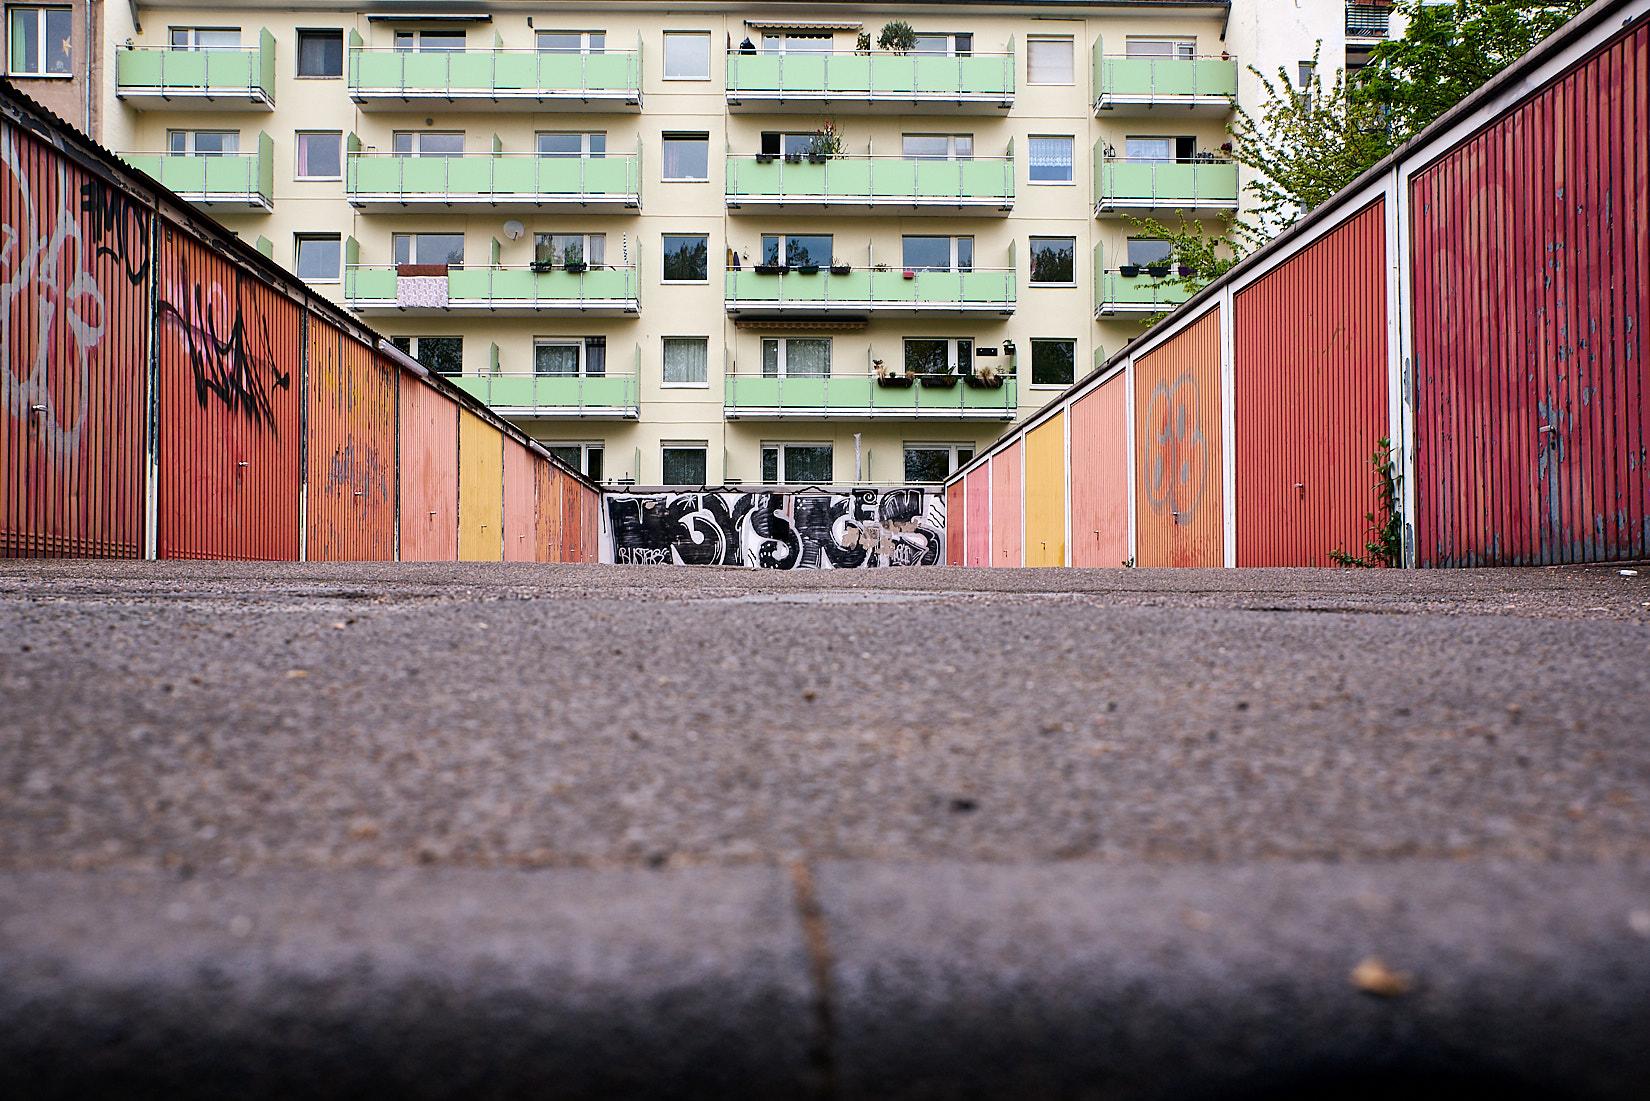 Hinterhof | Köln